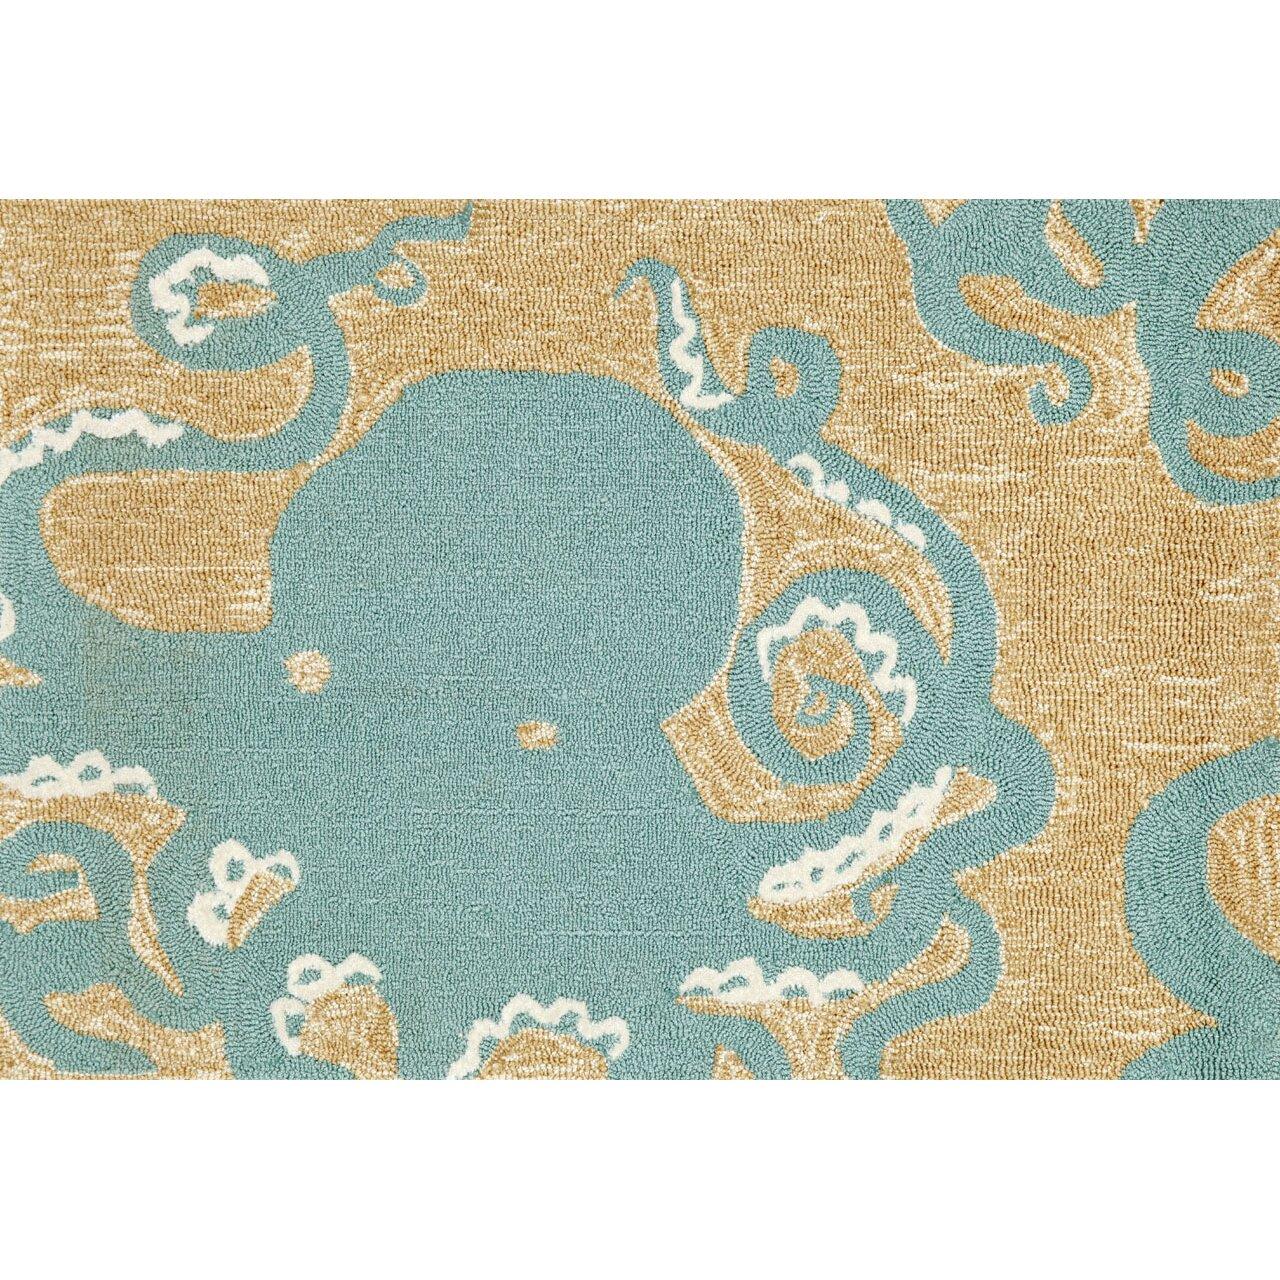 Transocean Dog Rug: Liora Manne Frontporch Octopus Area Rug & Reviews